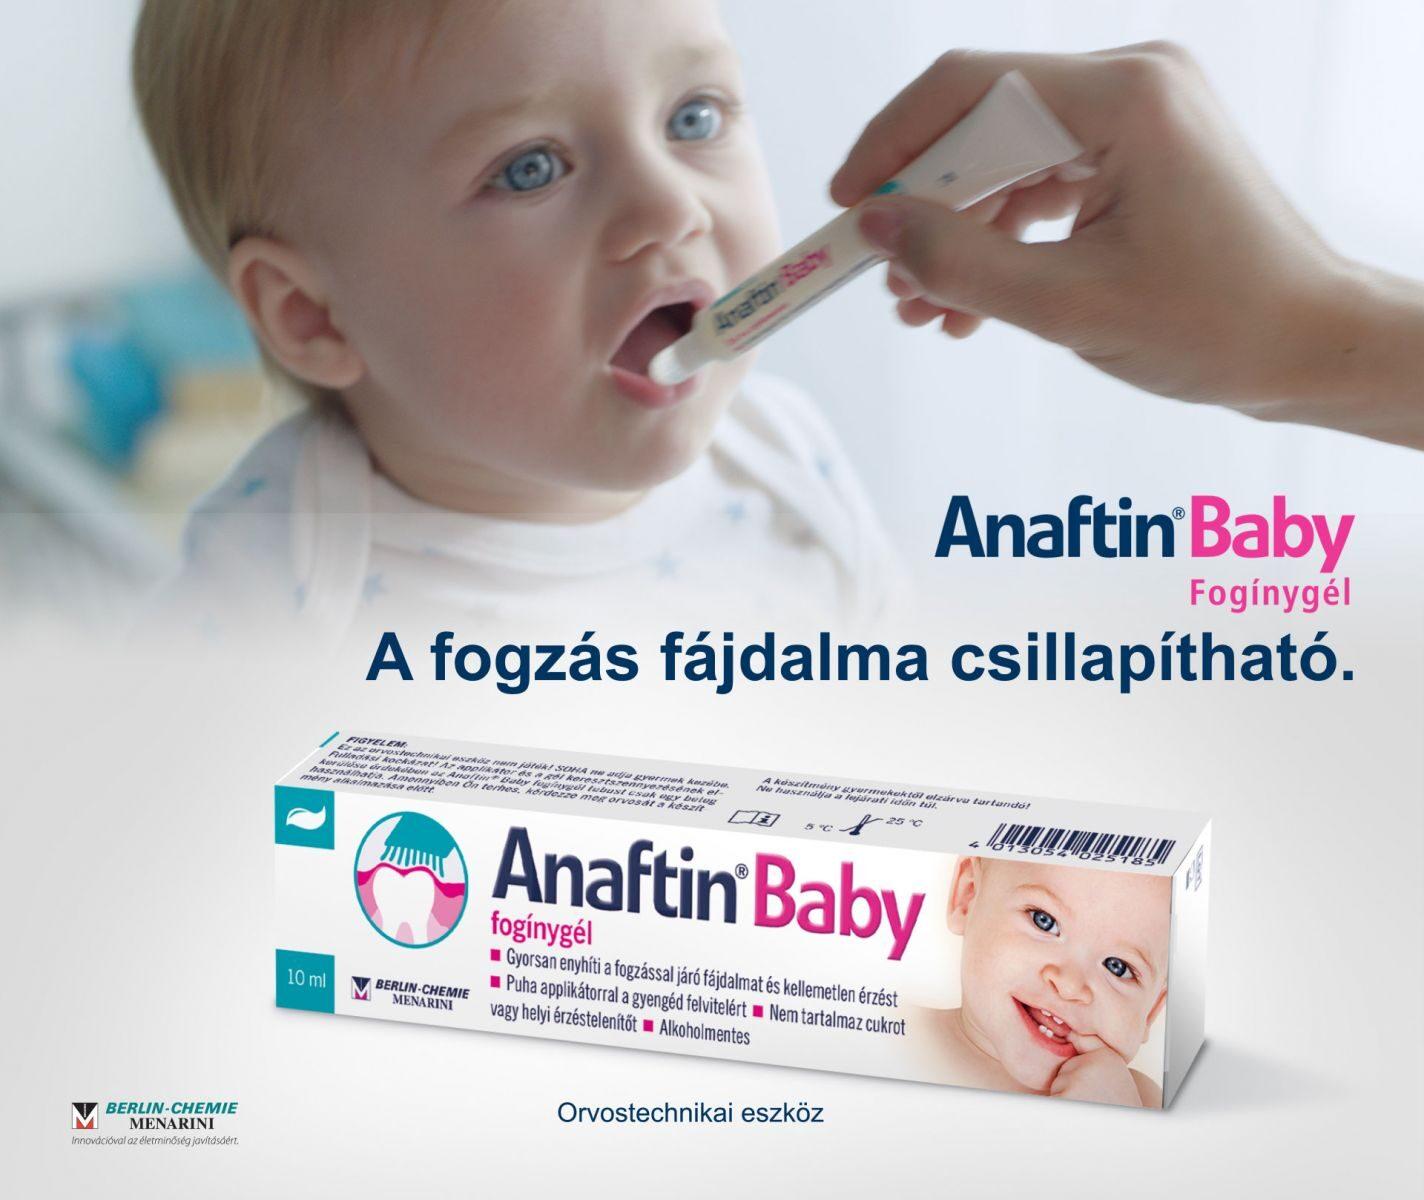 Anaftin Baby